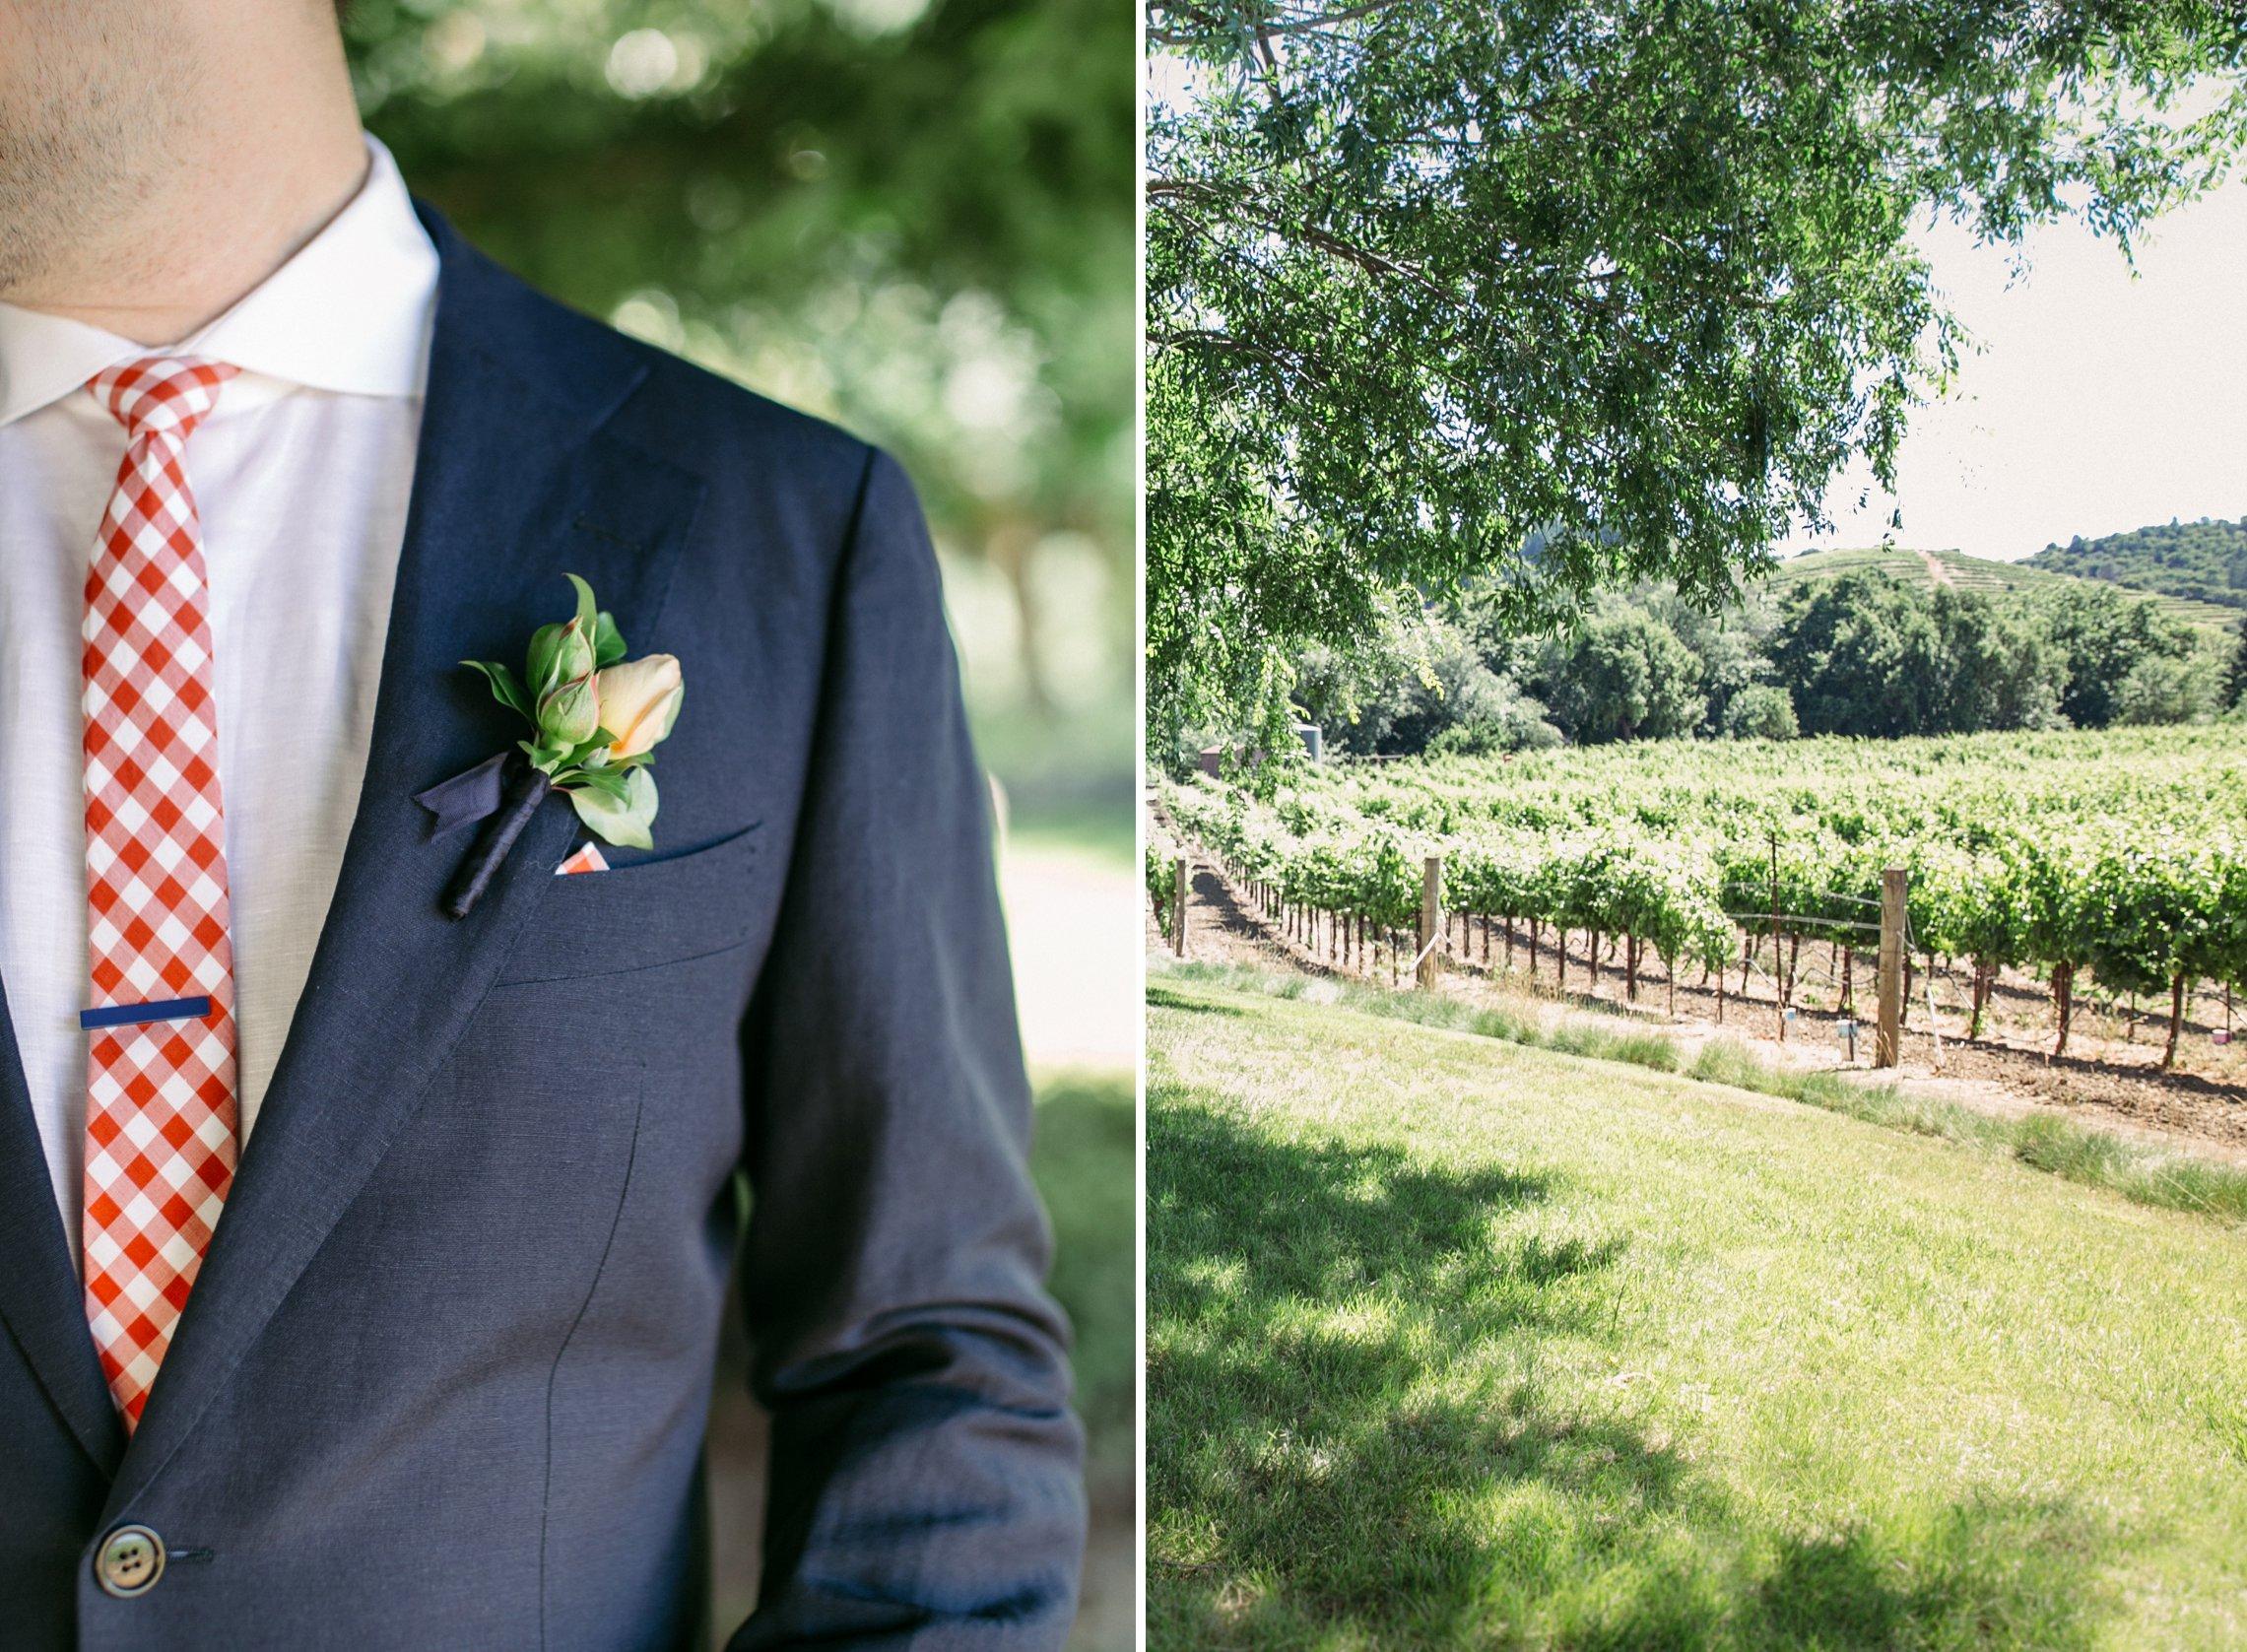 Healdsburg_Dutcher_Crossing_Winery_Wedding_0004.jpg